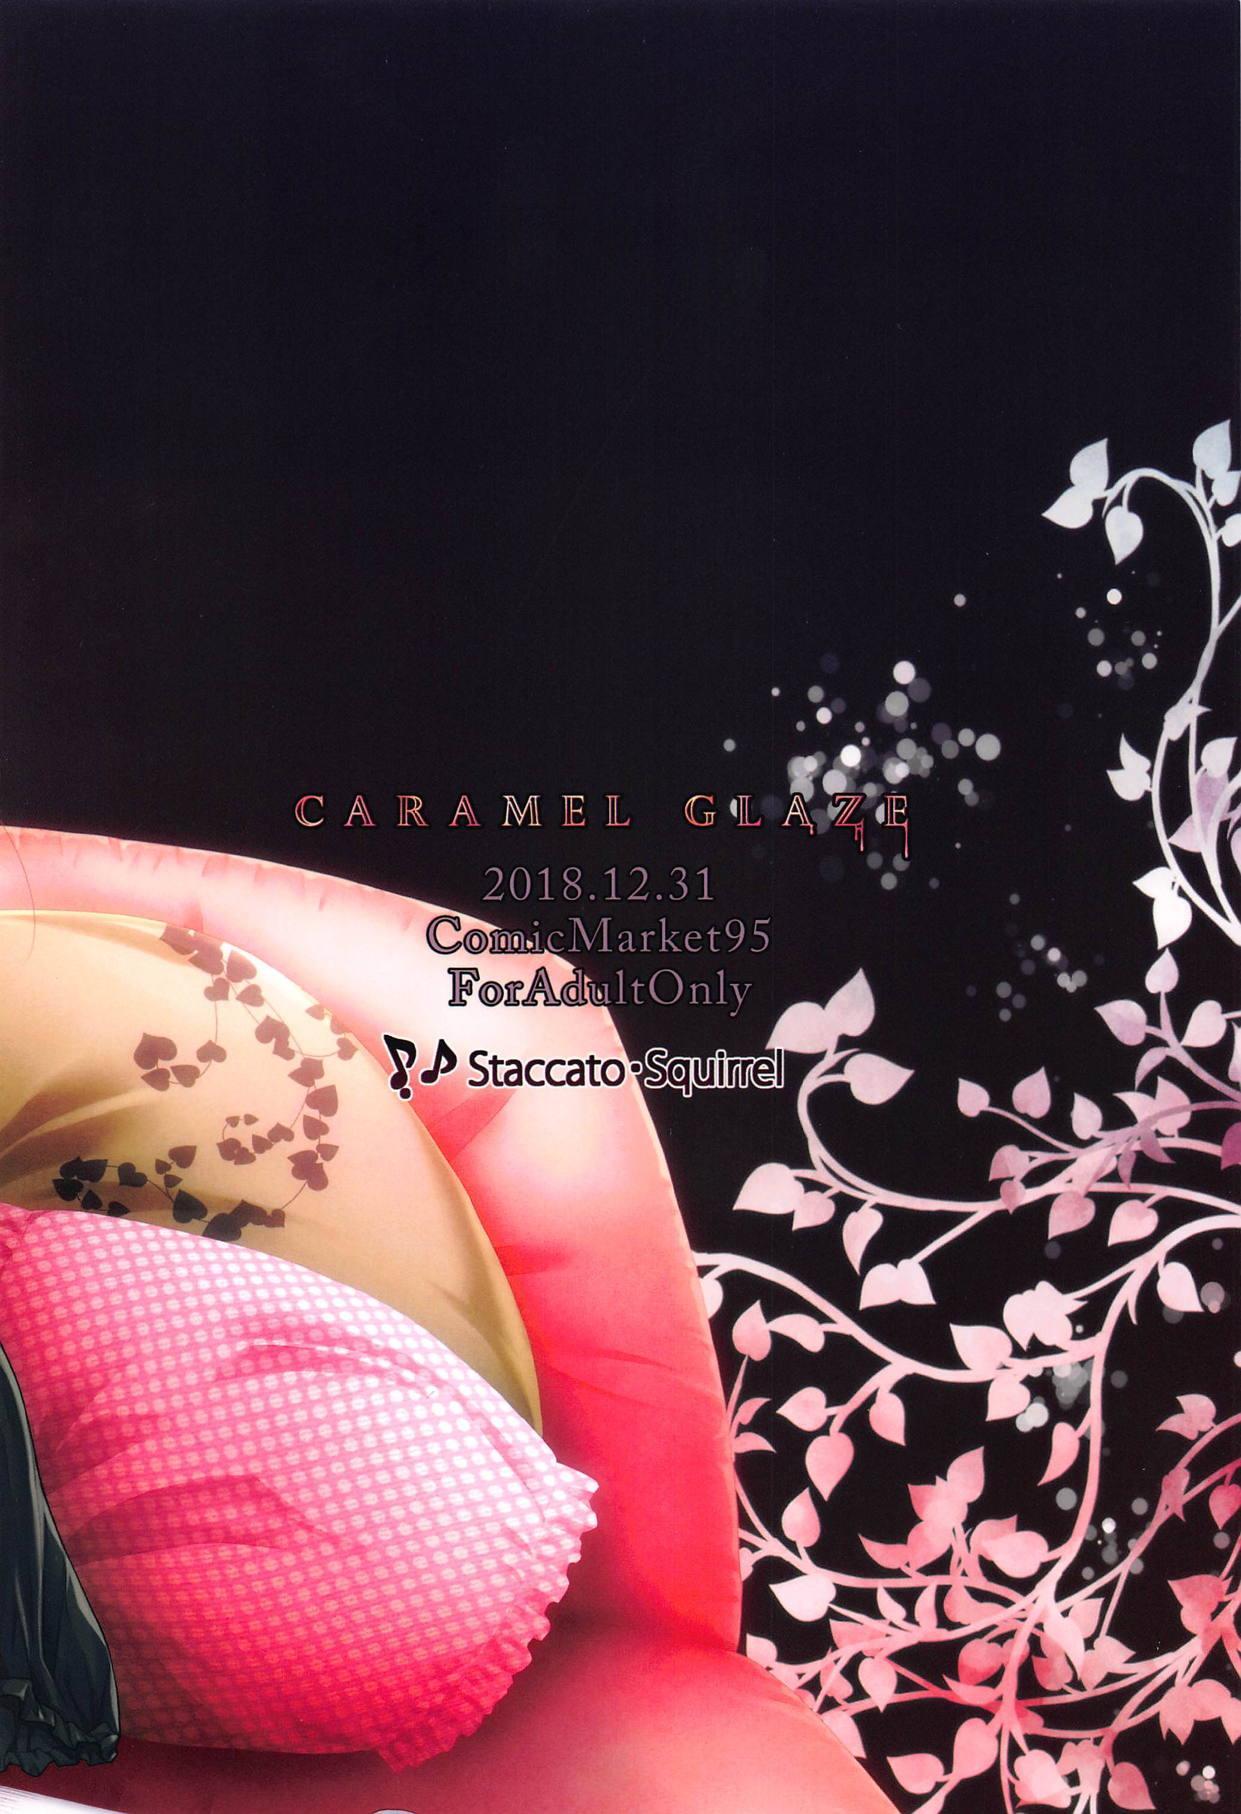 Caramel Glaze 25